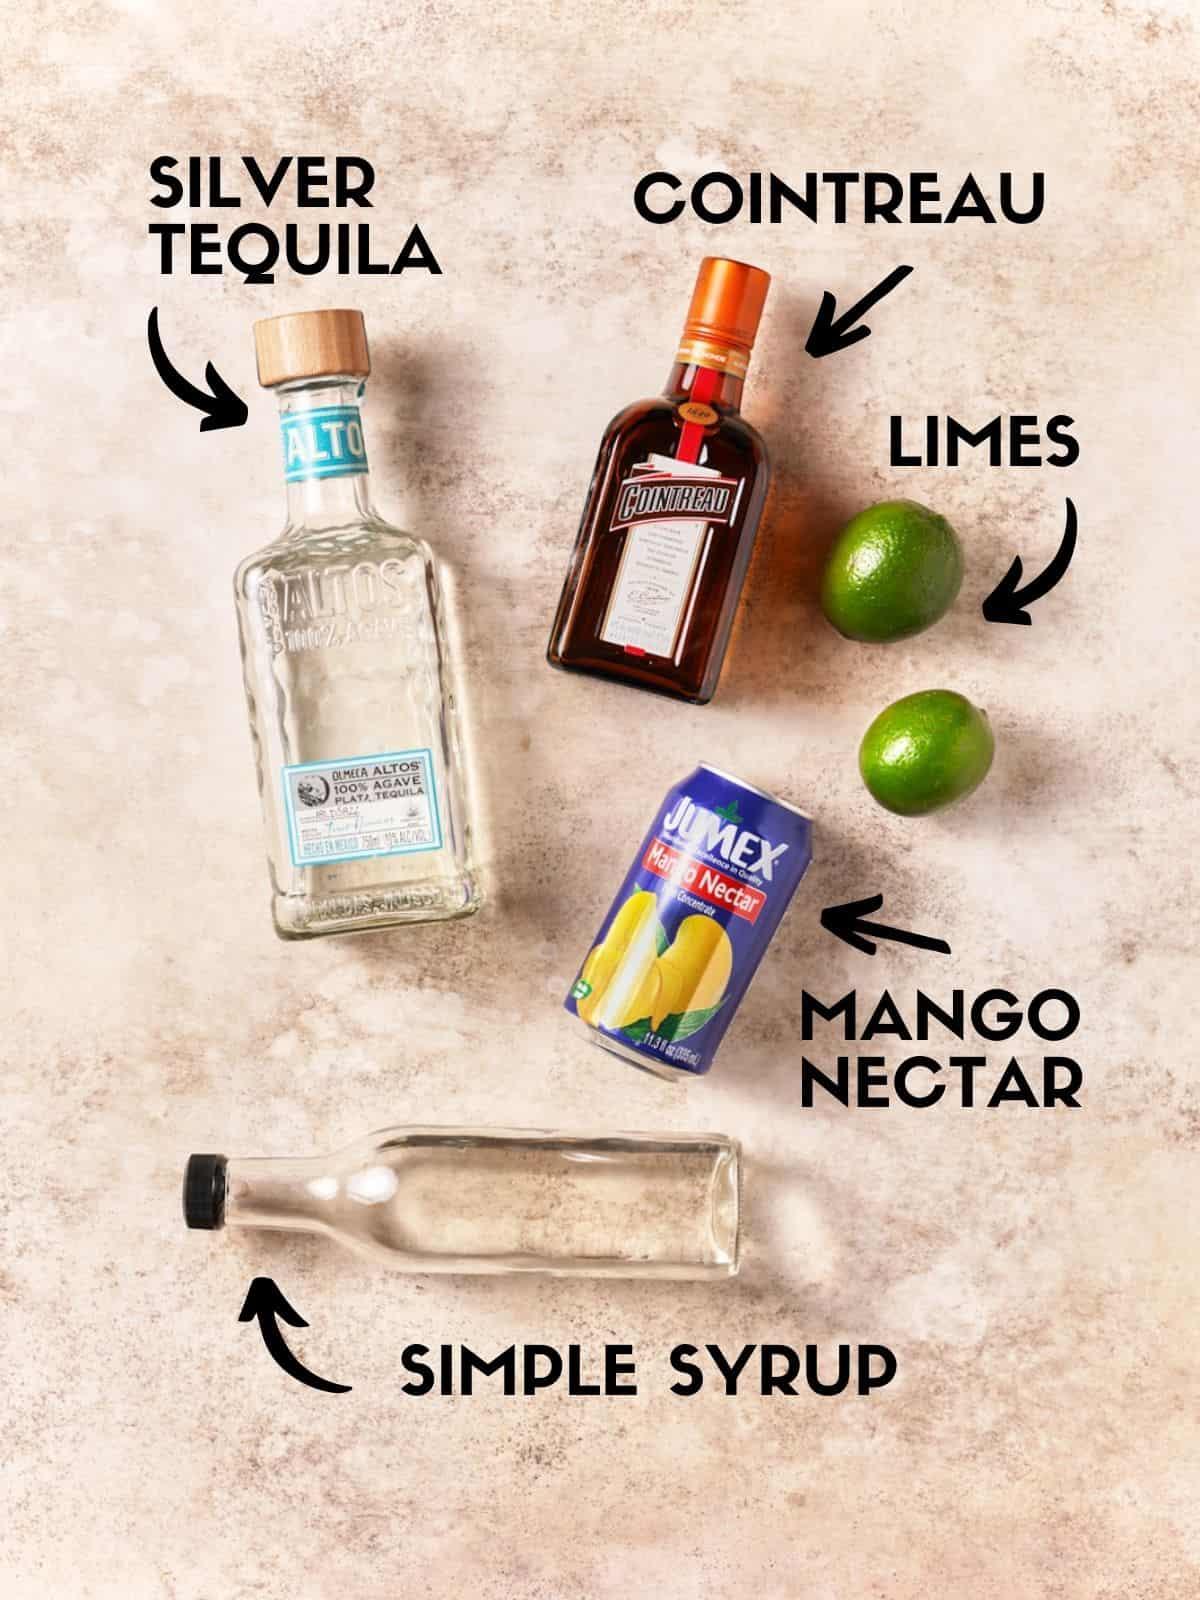 Ingredients to make mango margaritas, including tequila, orange liqueur and mango nectar.